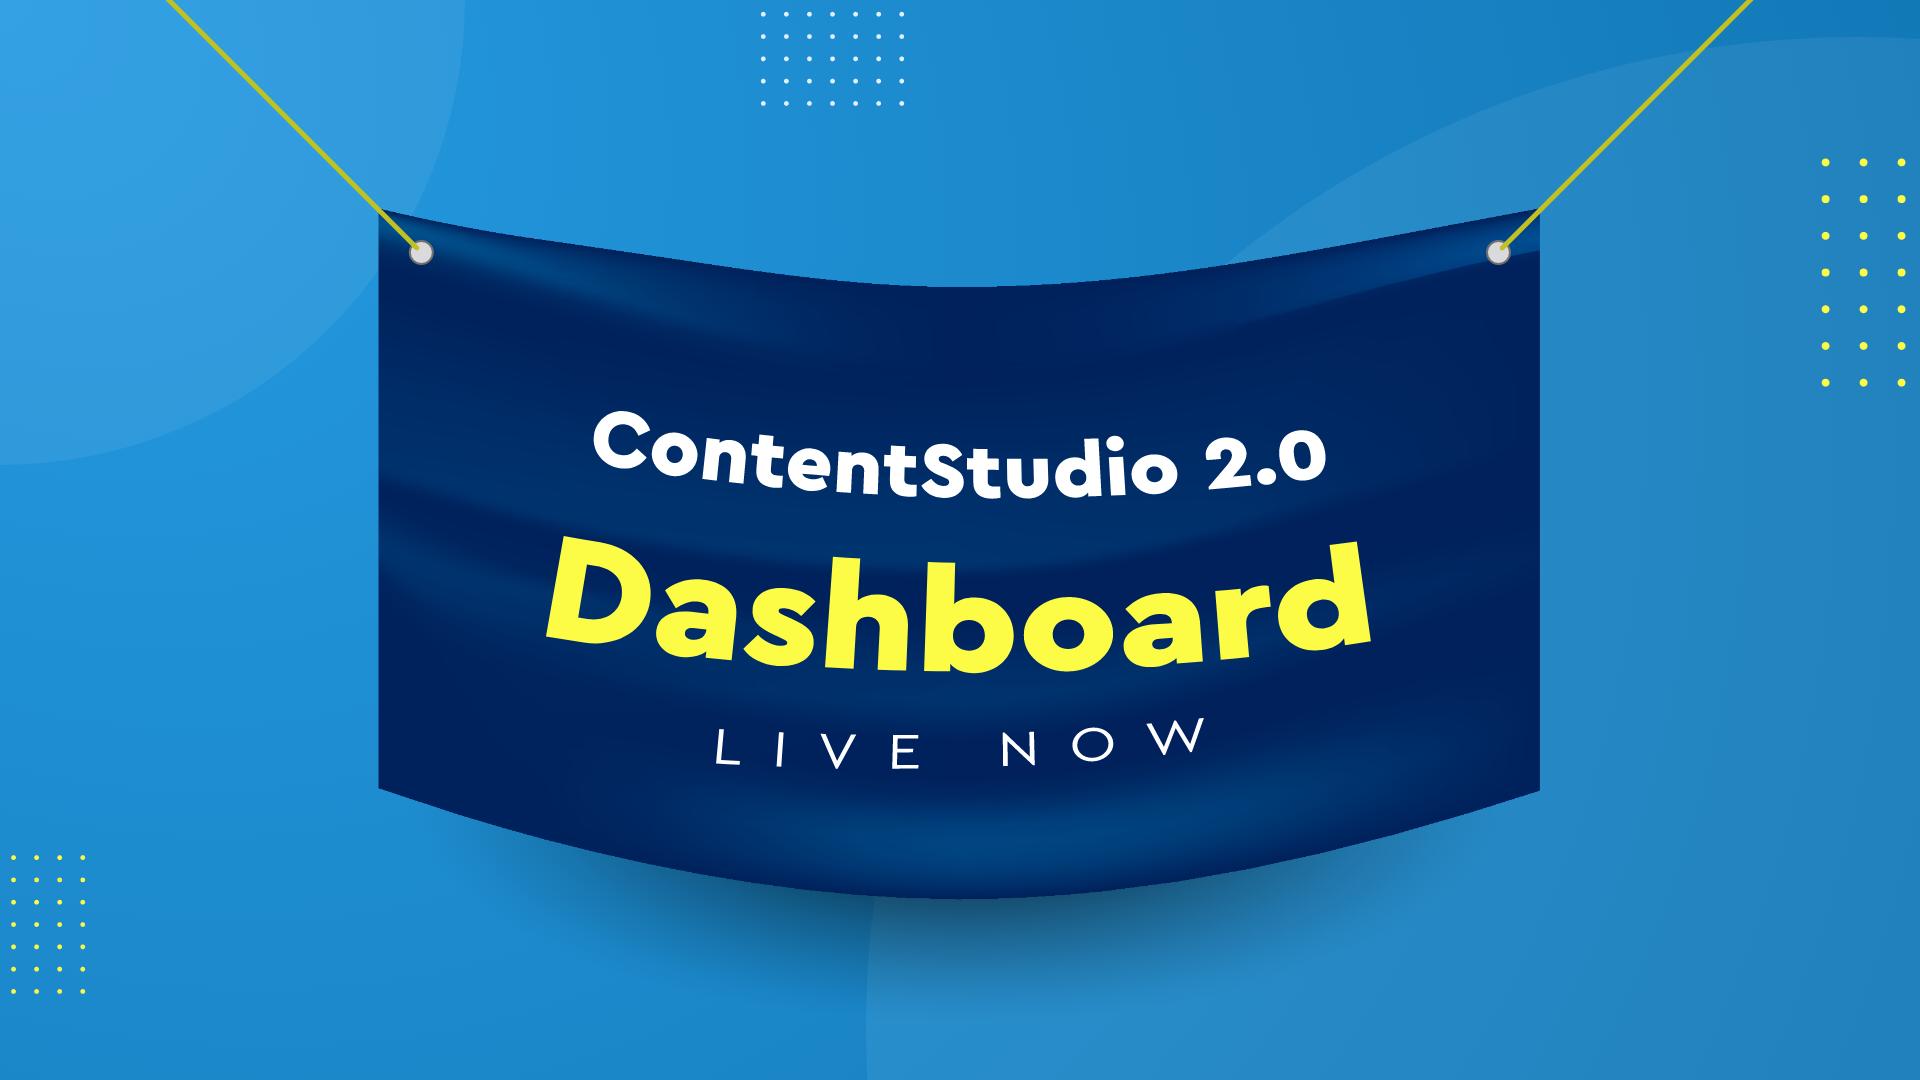 ContentStudio Dashboard